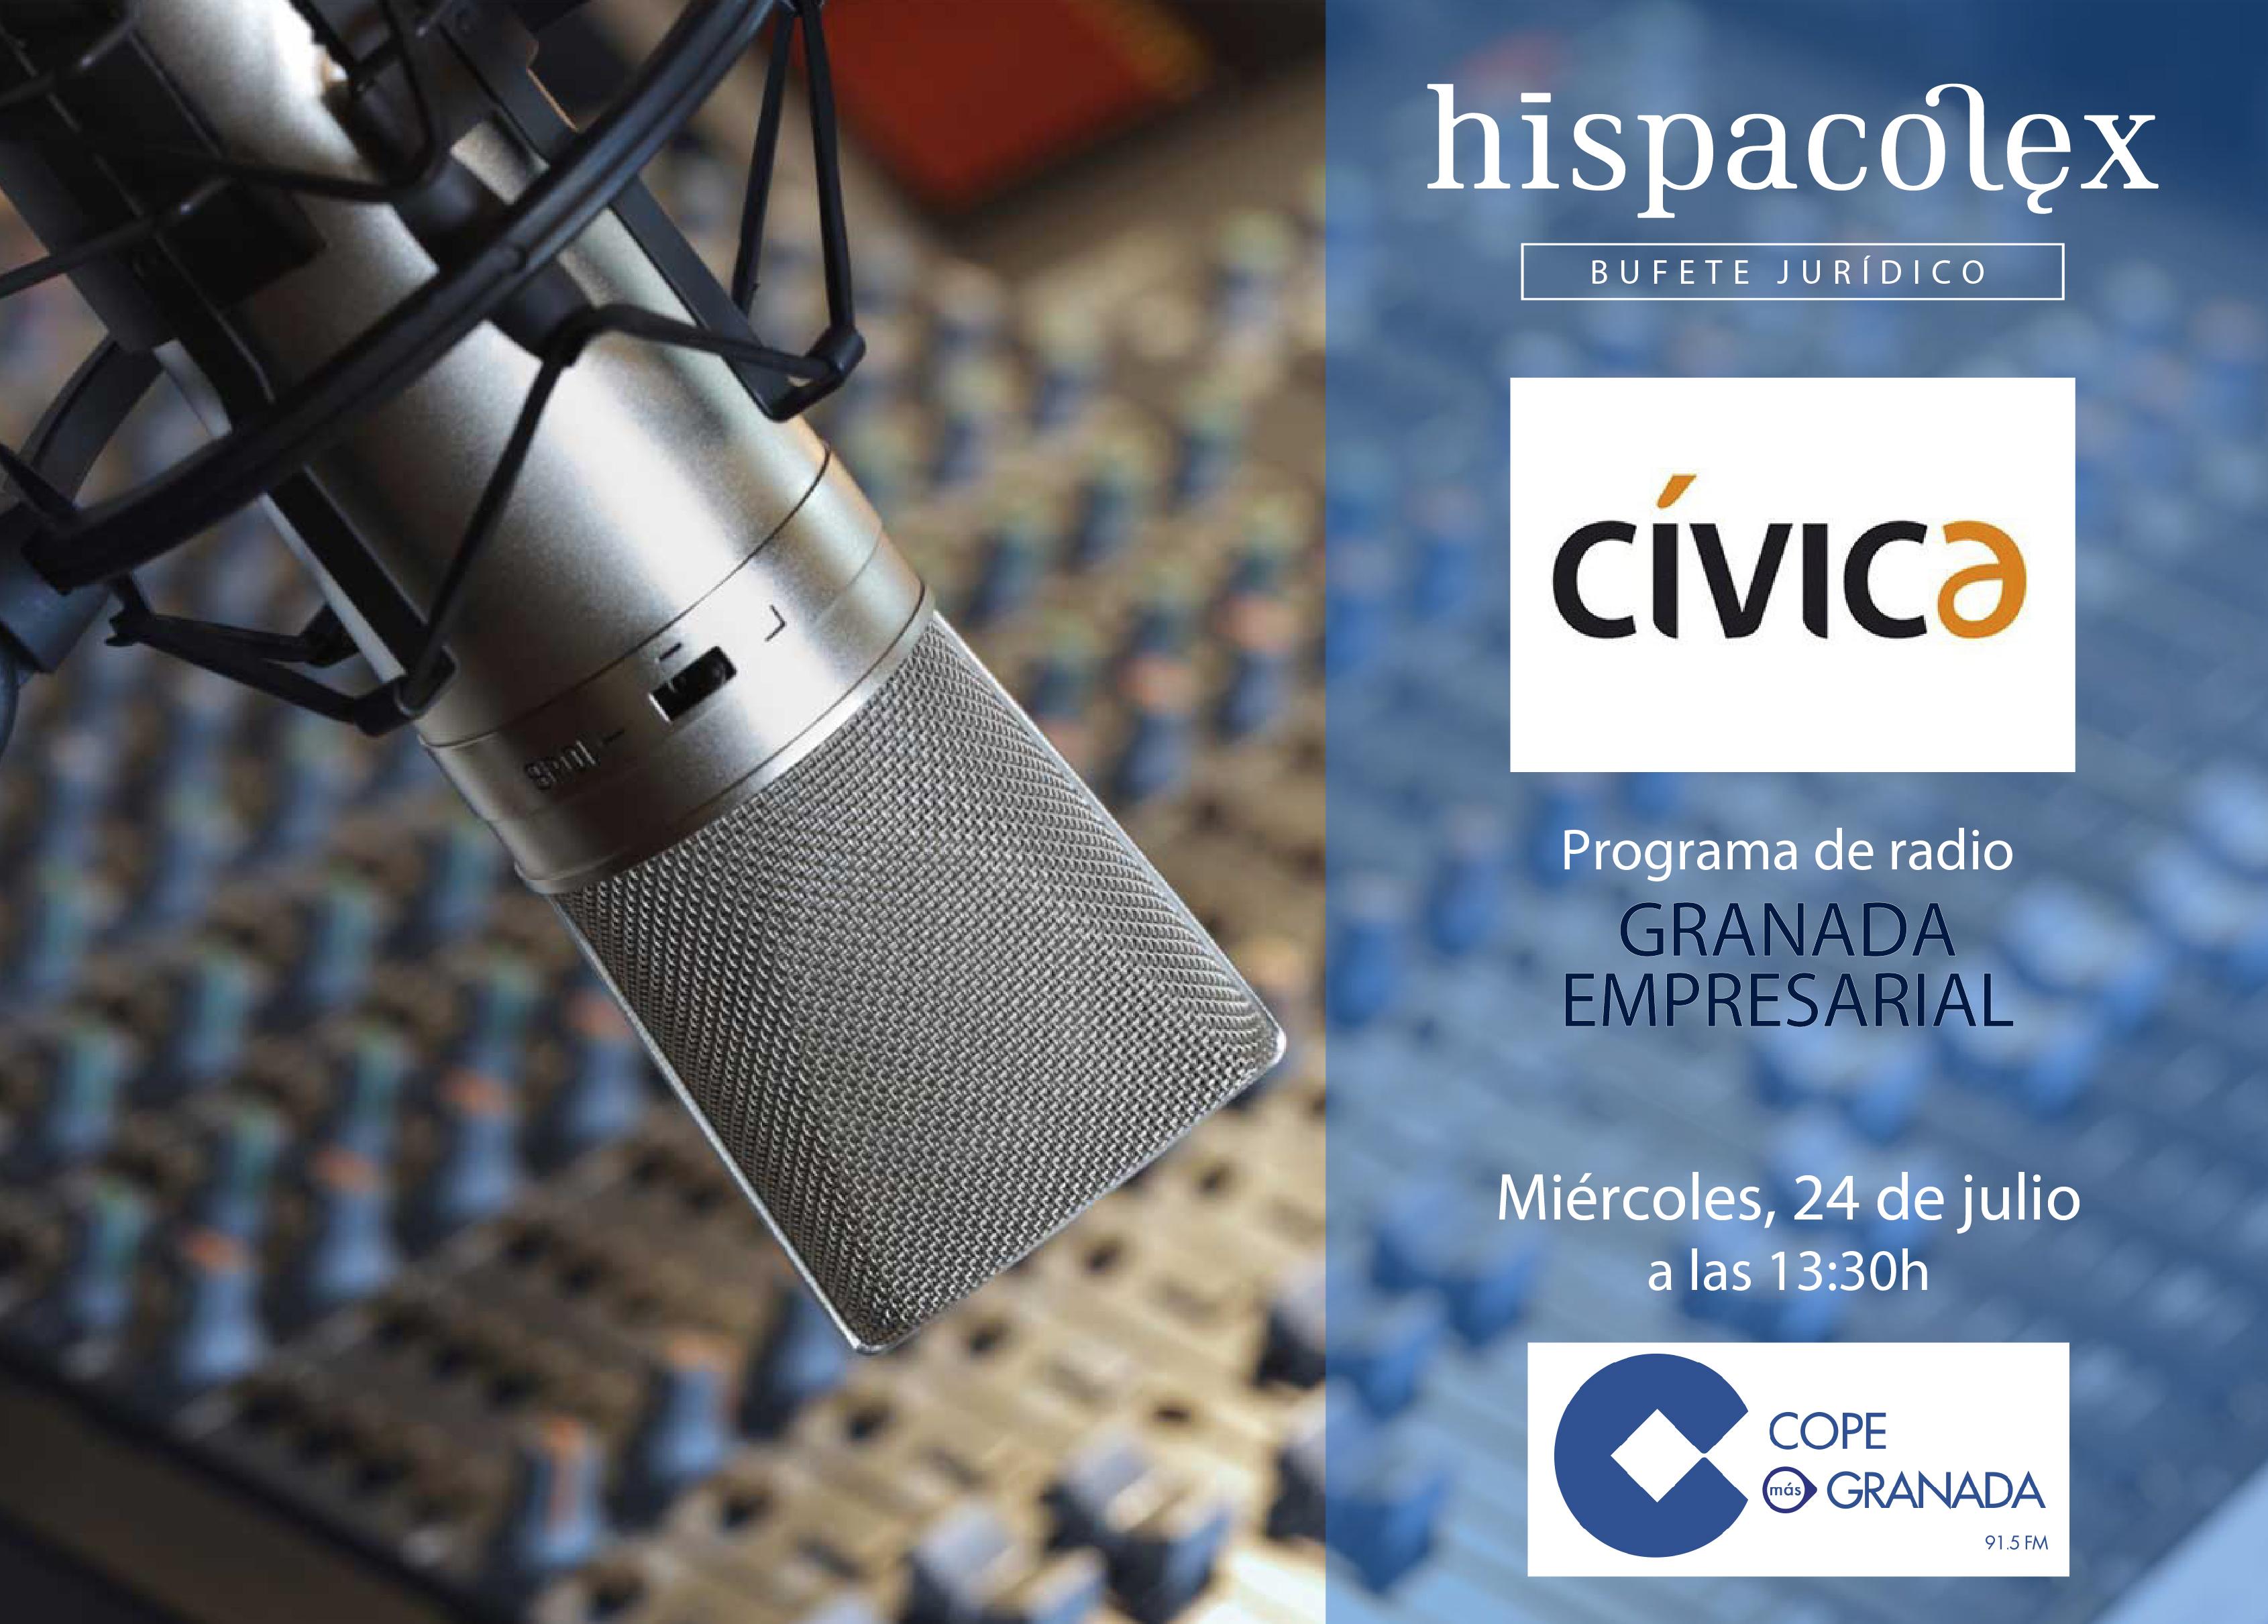 Imagen del audio Granada Empresarial: Entrevista a Josep Roig Salvador, Director general de Cívica Software